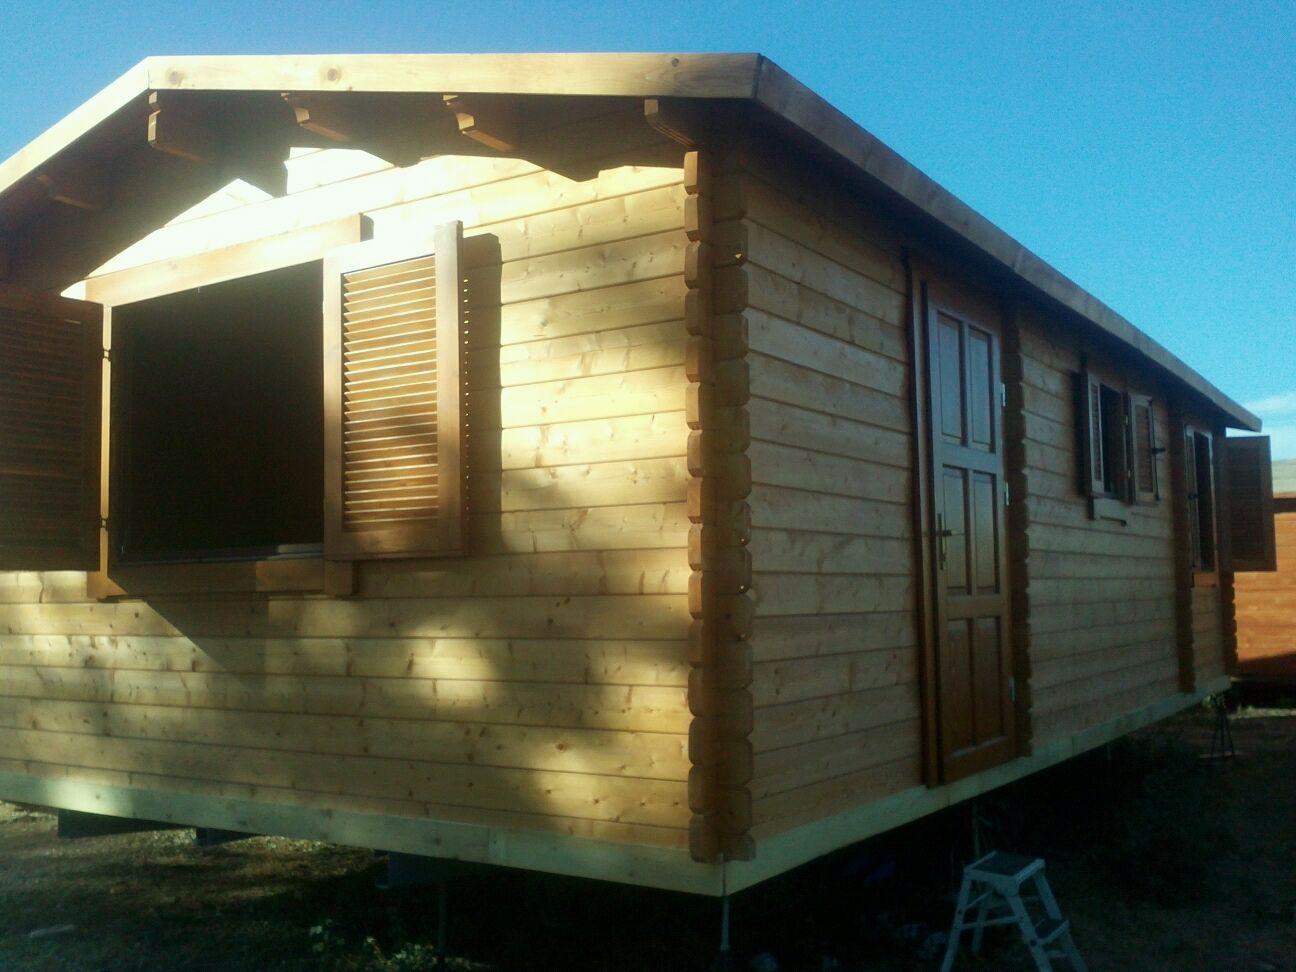 Casa movil de madera c diz de 9 5 metros tucaravana - Casas de madera cadiz ...